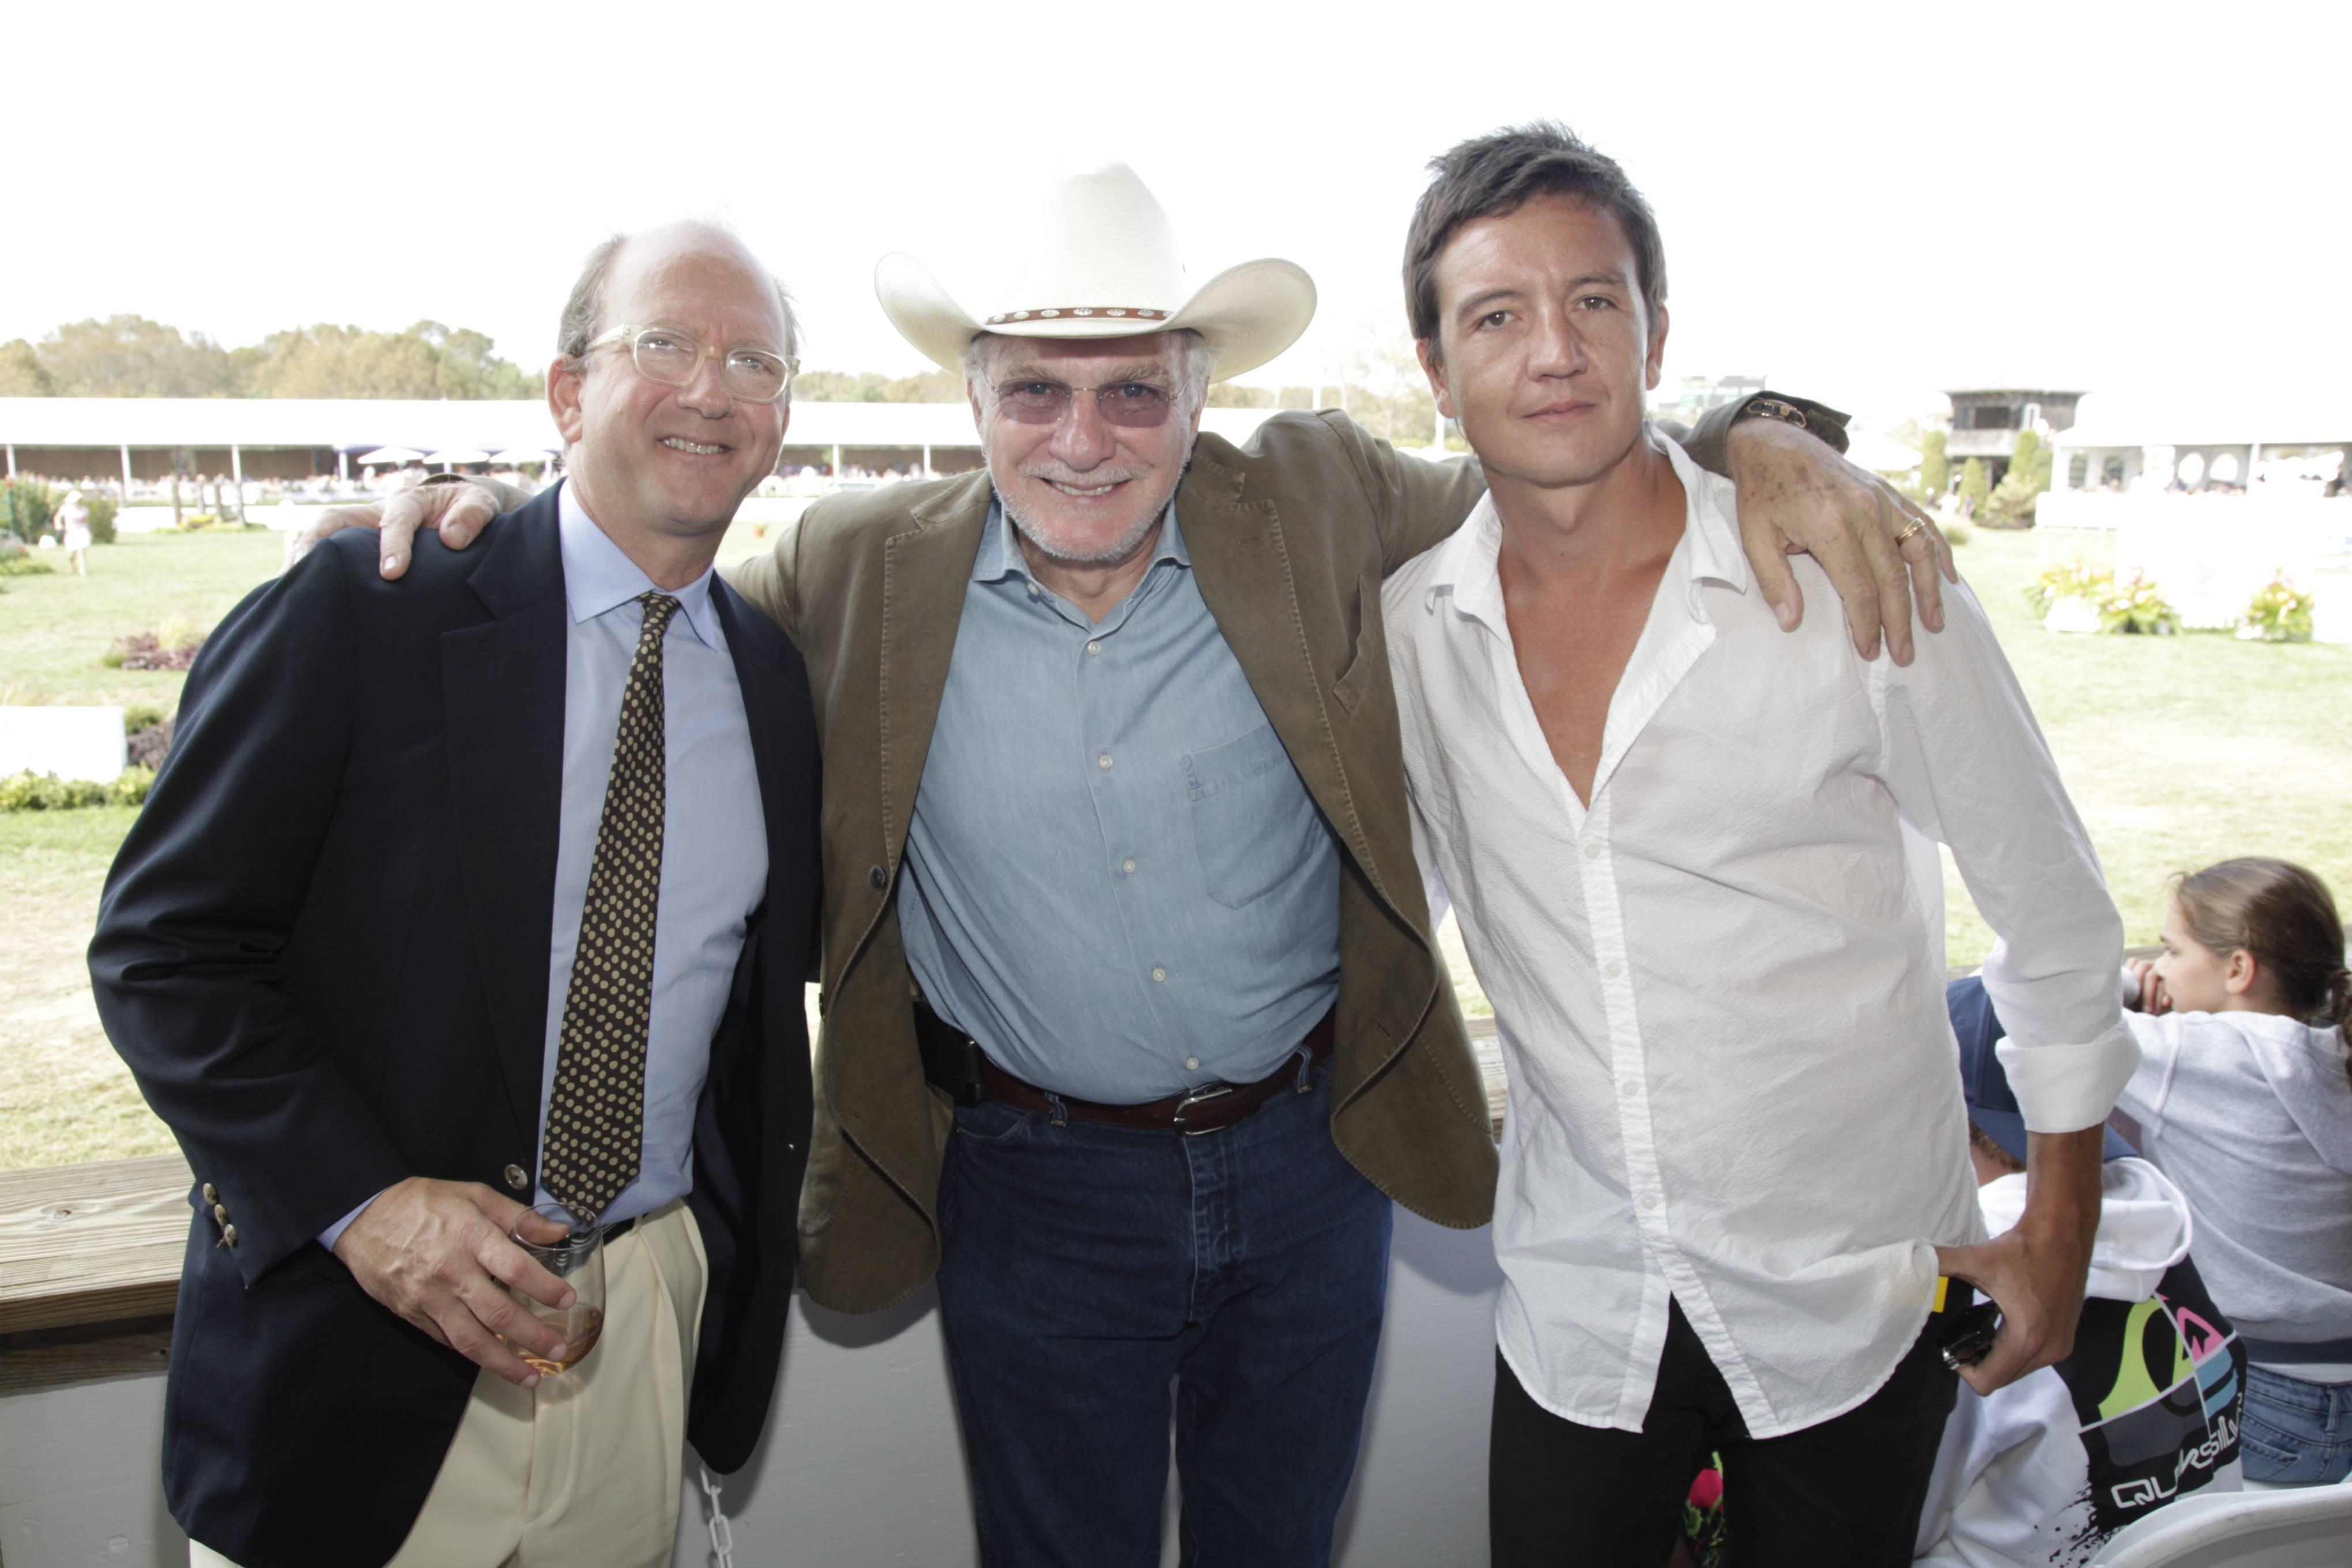 Bruce Herzog, David Yurman, Anthony James